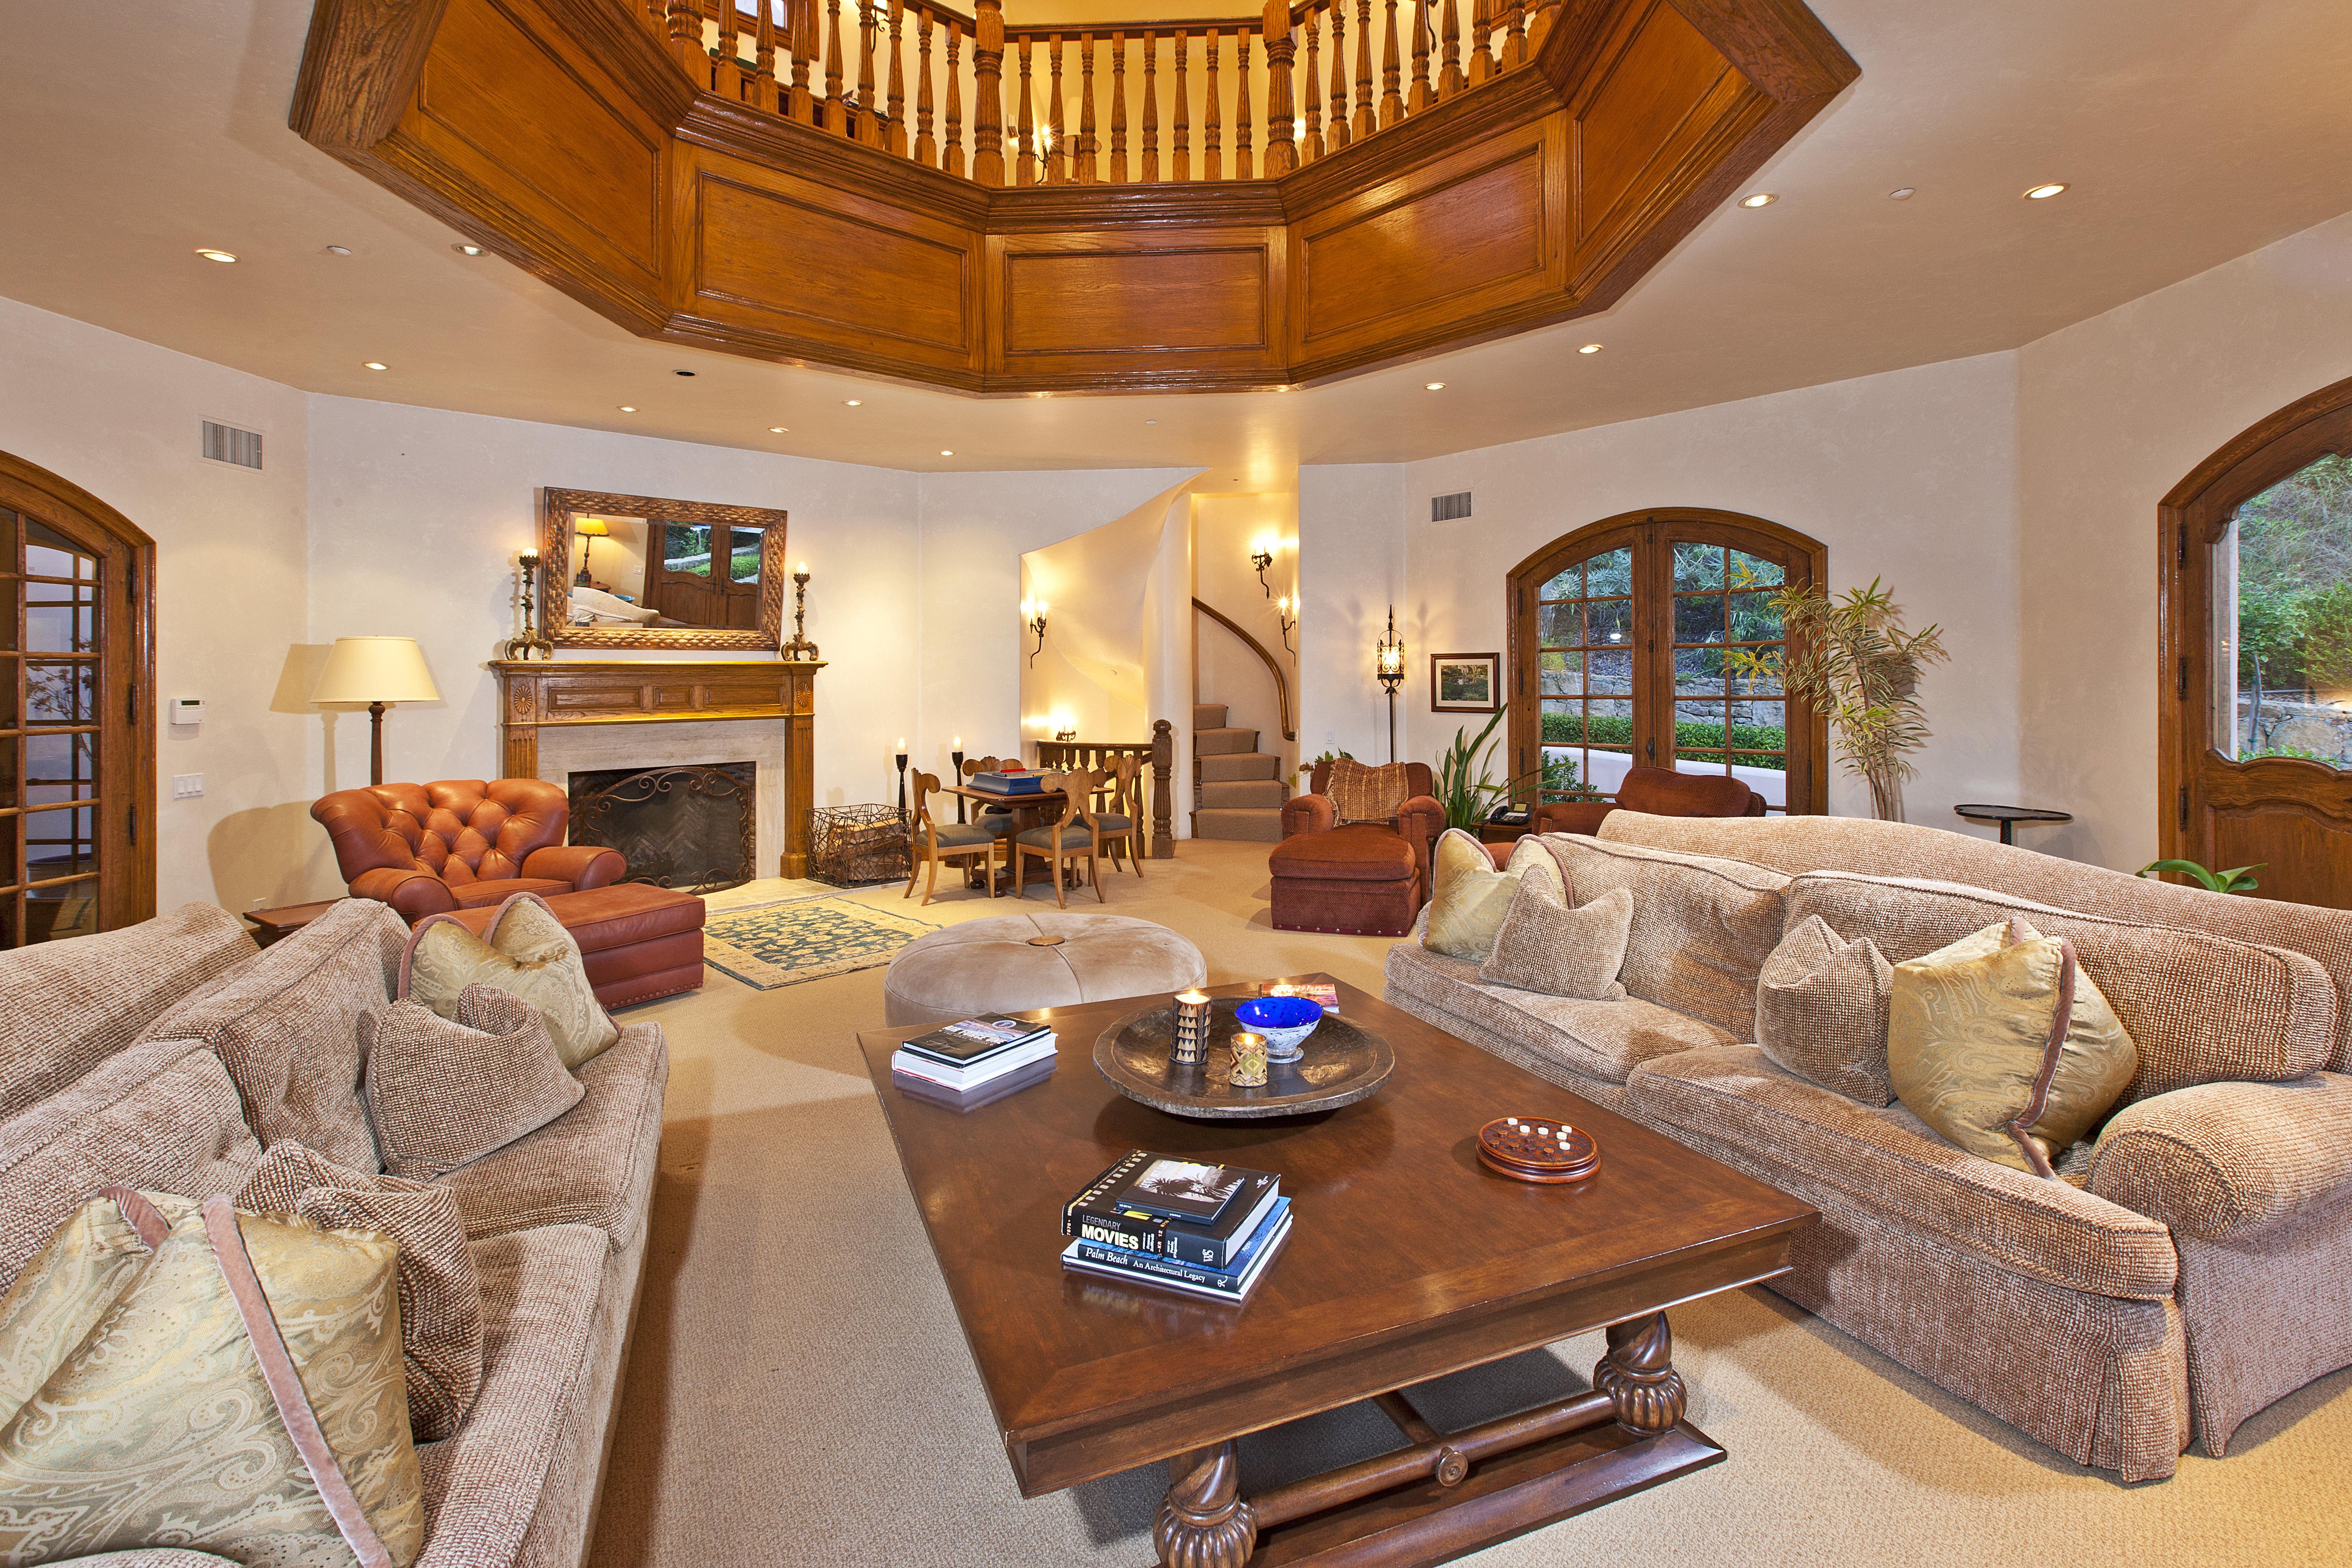 1 Million Price Cut On Camille Grammer S Malibu Home